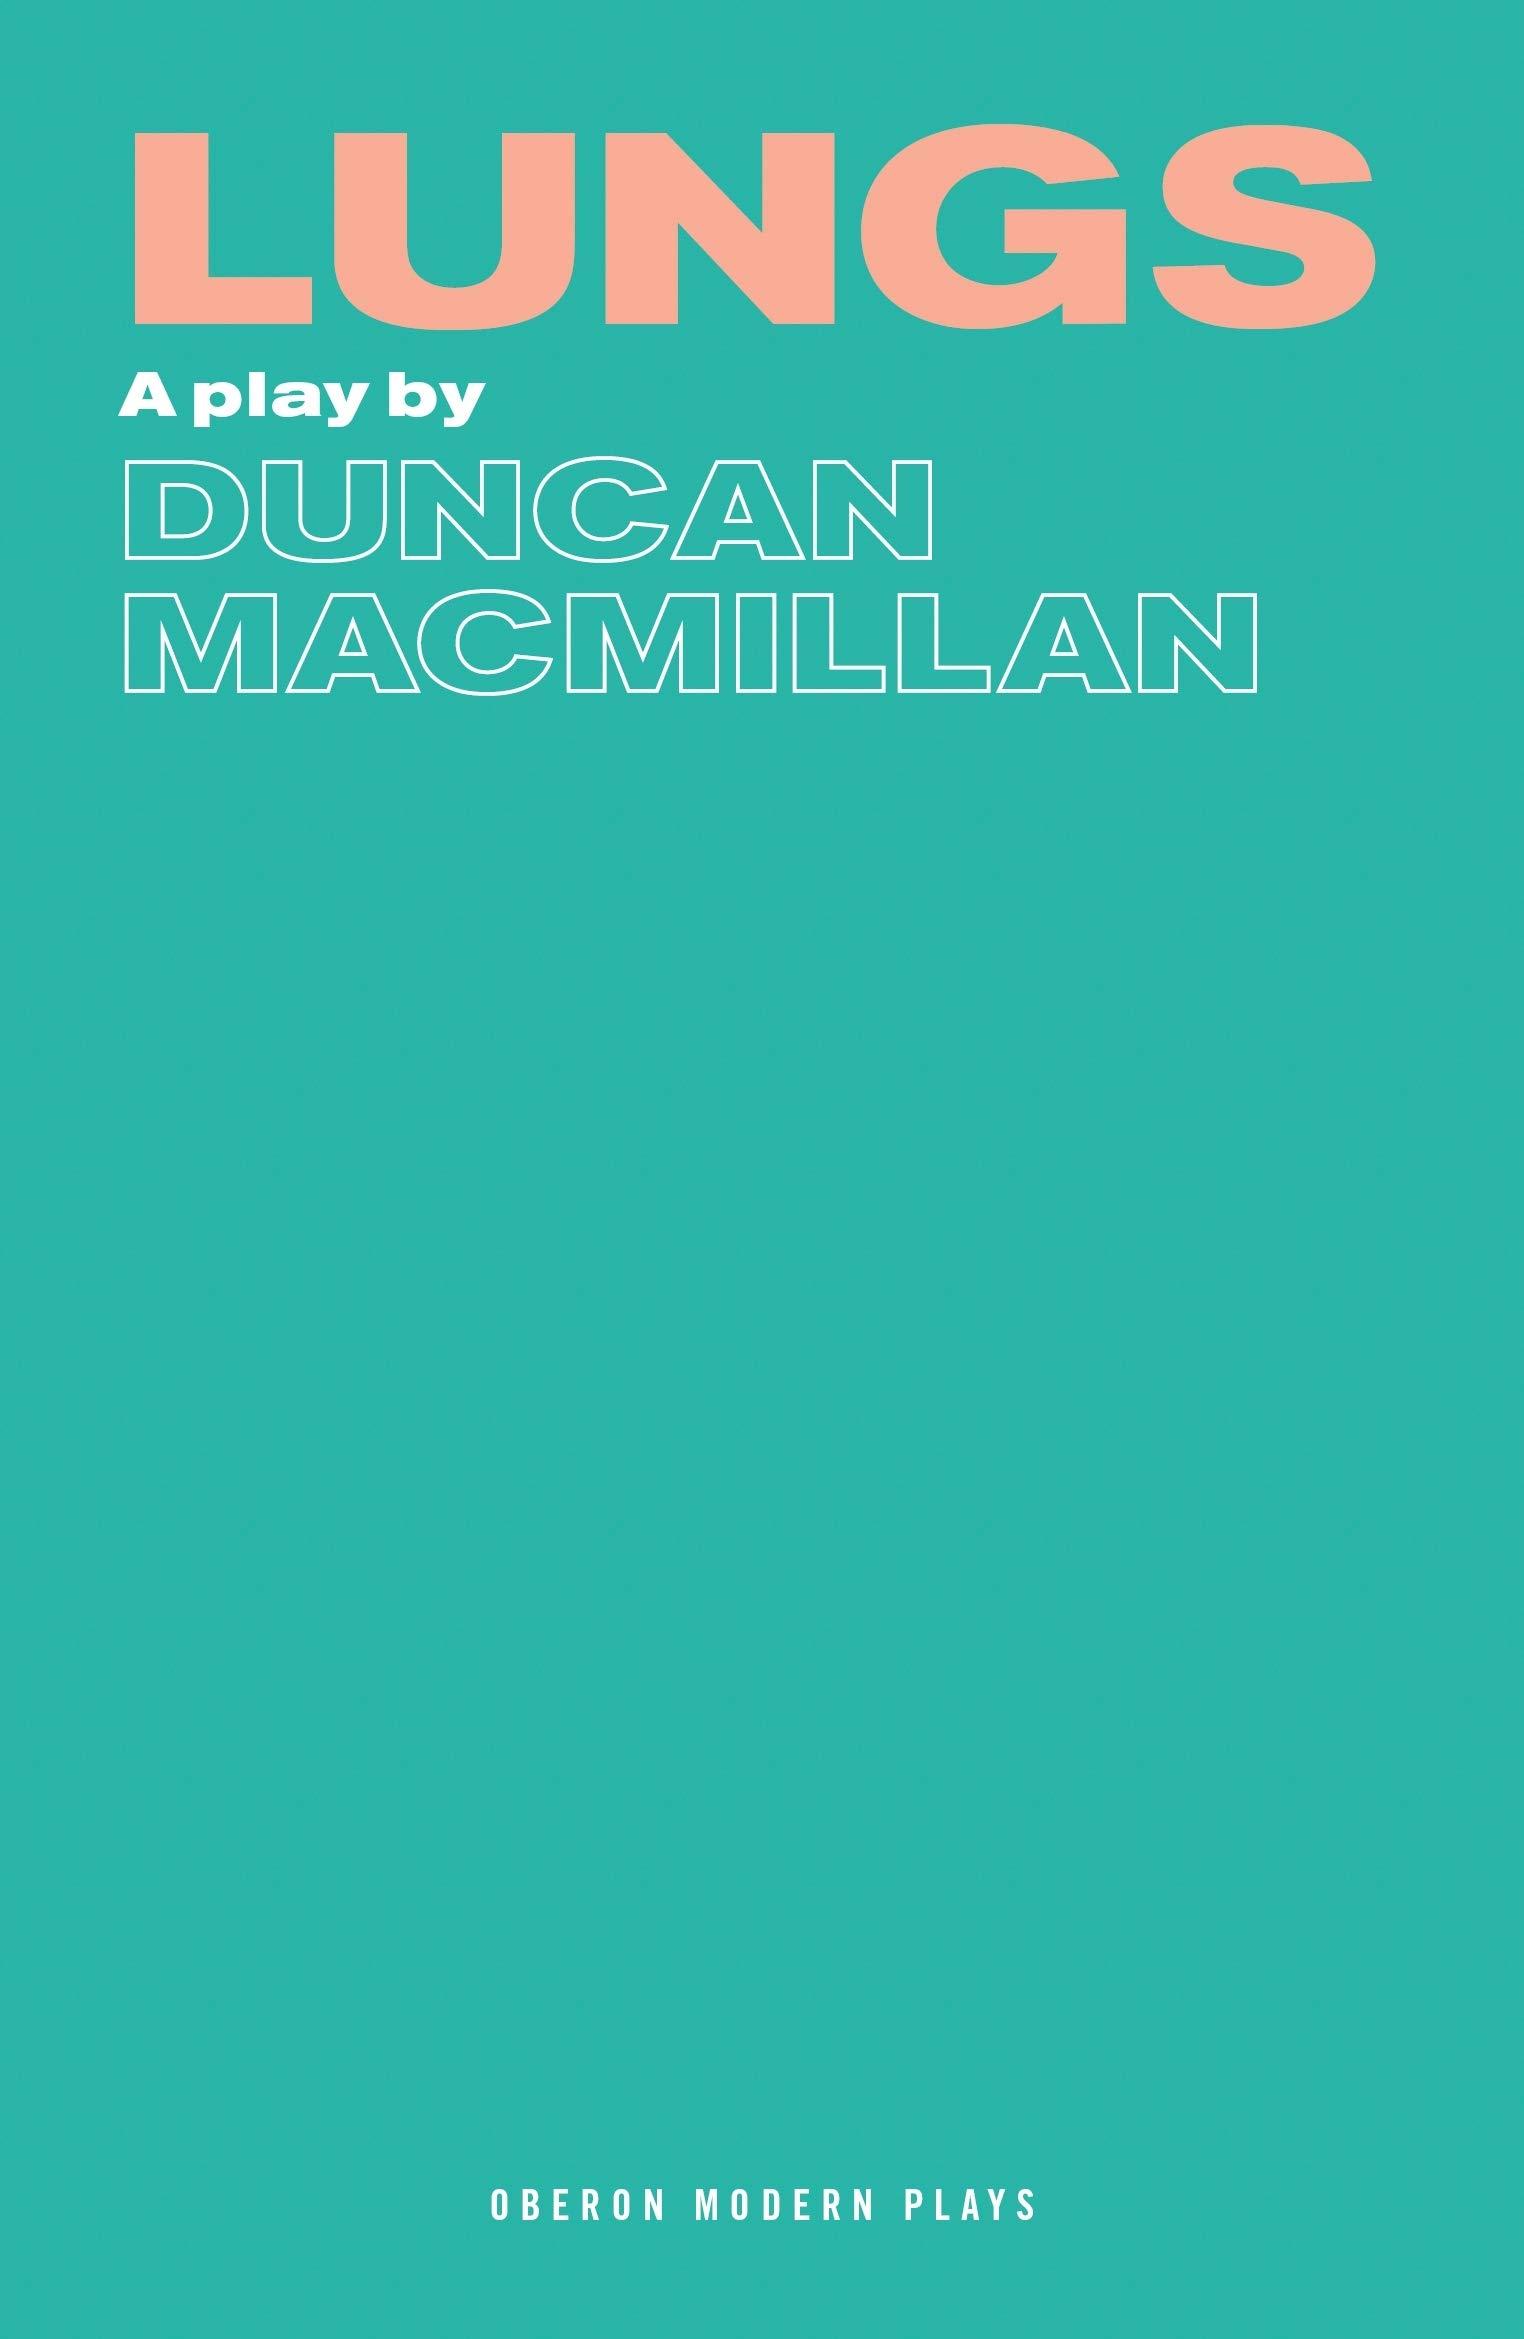 Amazon.com: Lungs (Oberon Modern Plays) (9781849431453): Macmillan, Duncan:  Books